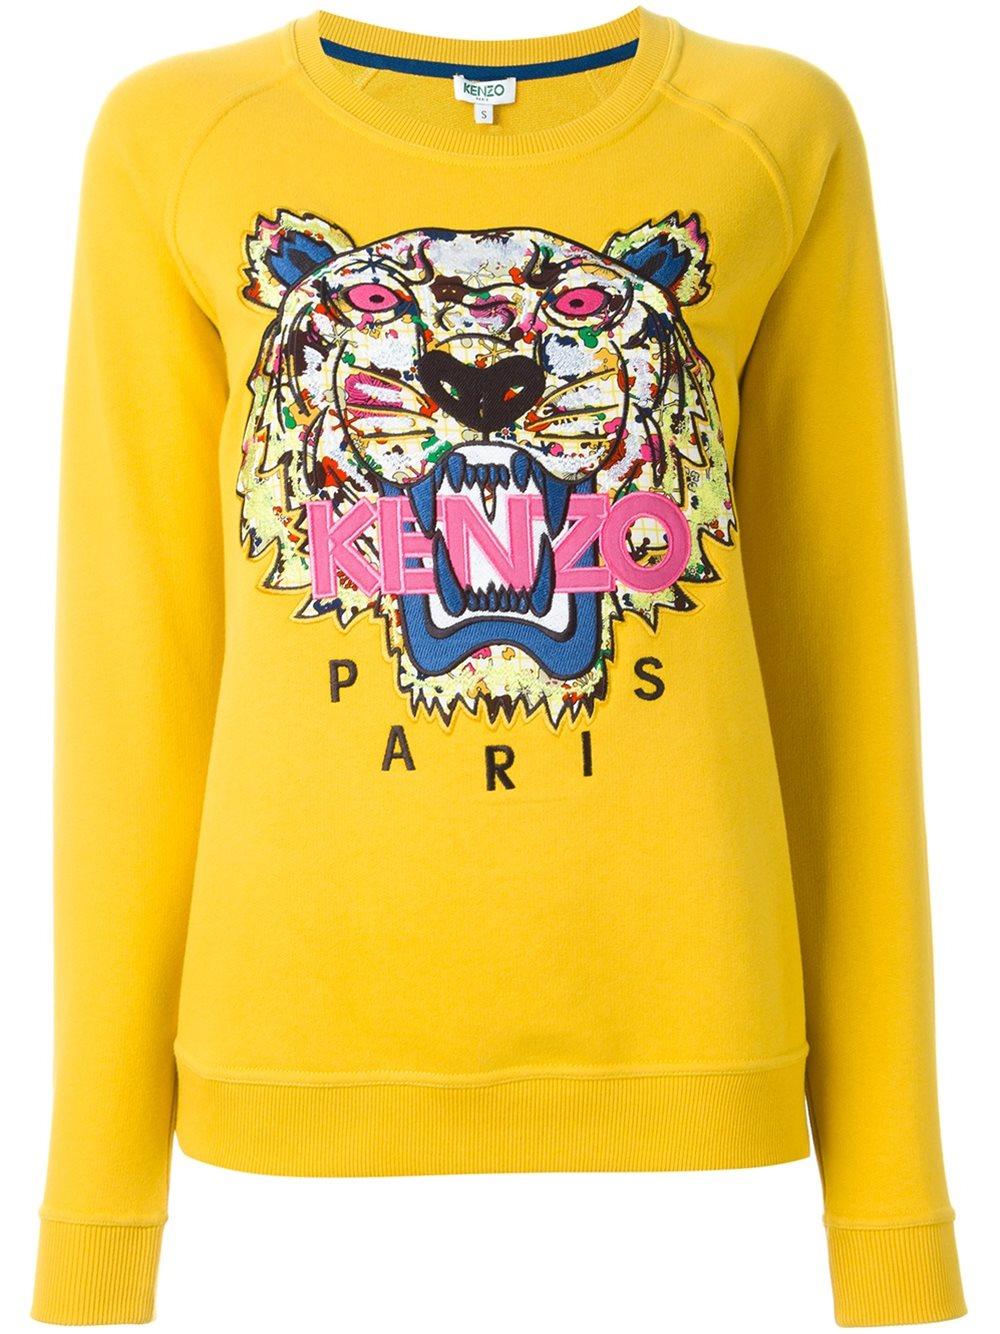 2c40a22f2ce3 Kenzo sweat Tiger Femme Clothing,sac kenzo kalifornia gris,prix pas ...